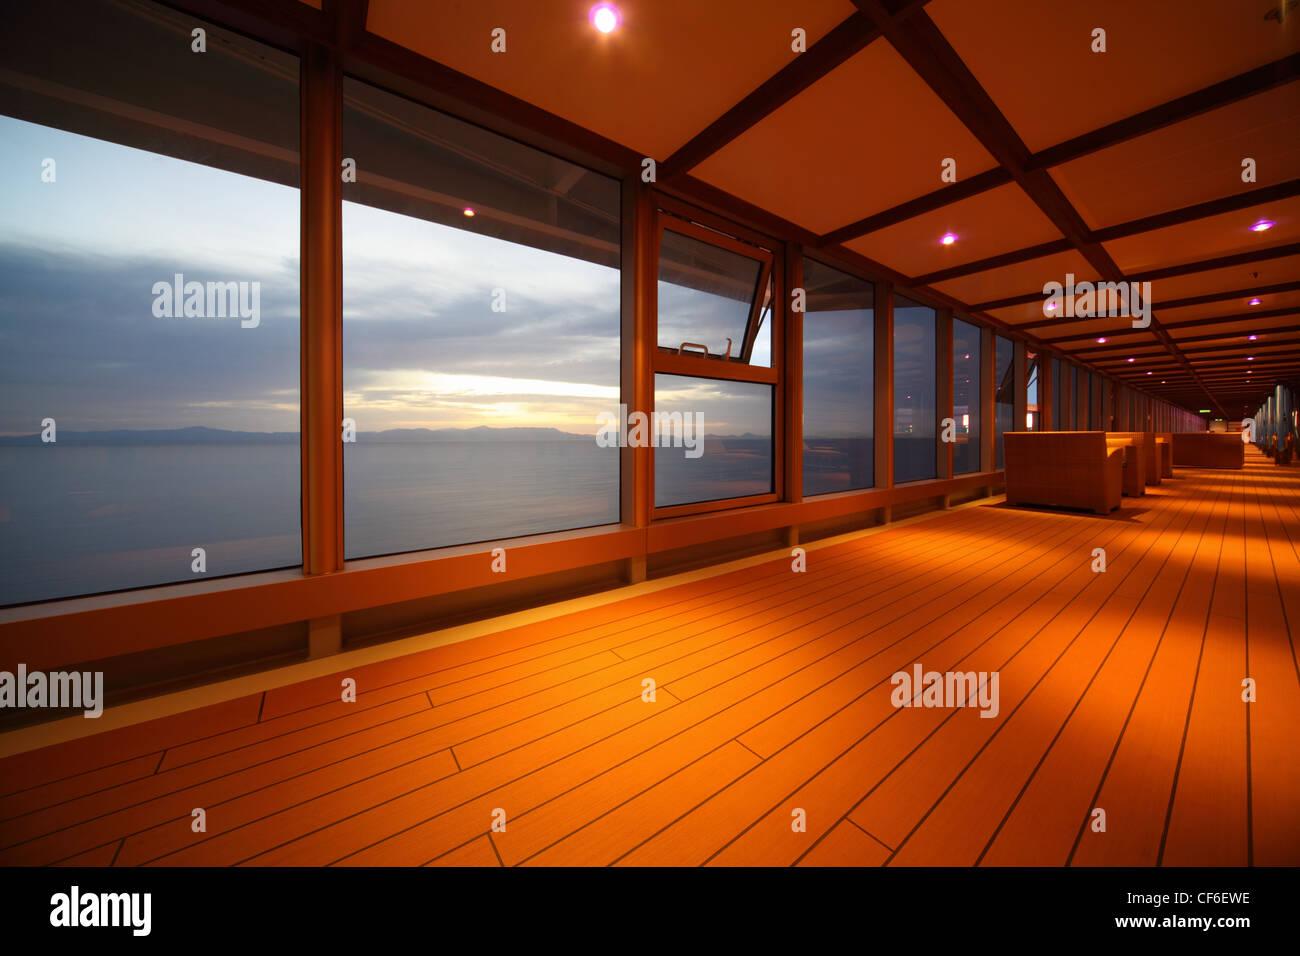 corridor on cruise ship. row of lamps. beautiful view  through window. - Stock Image